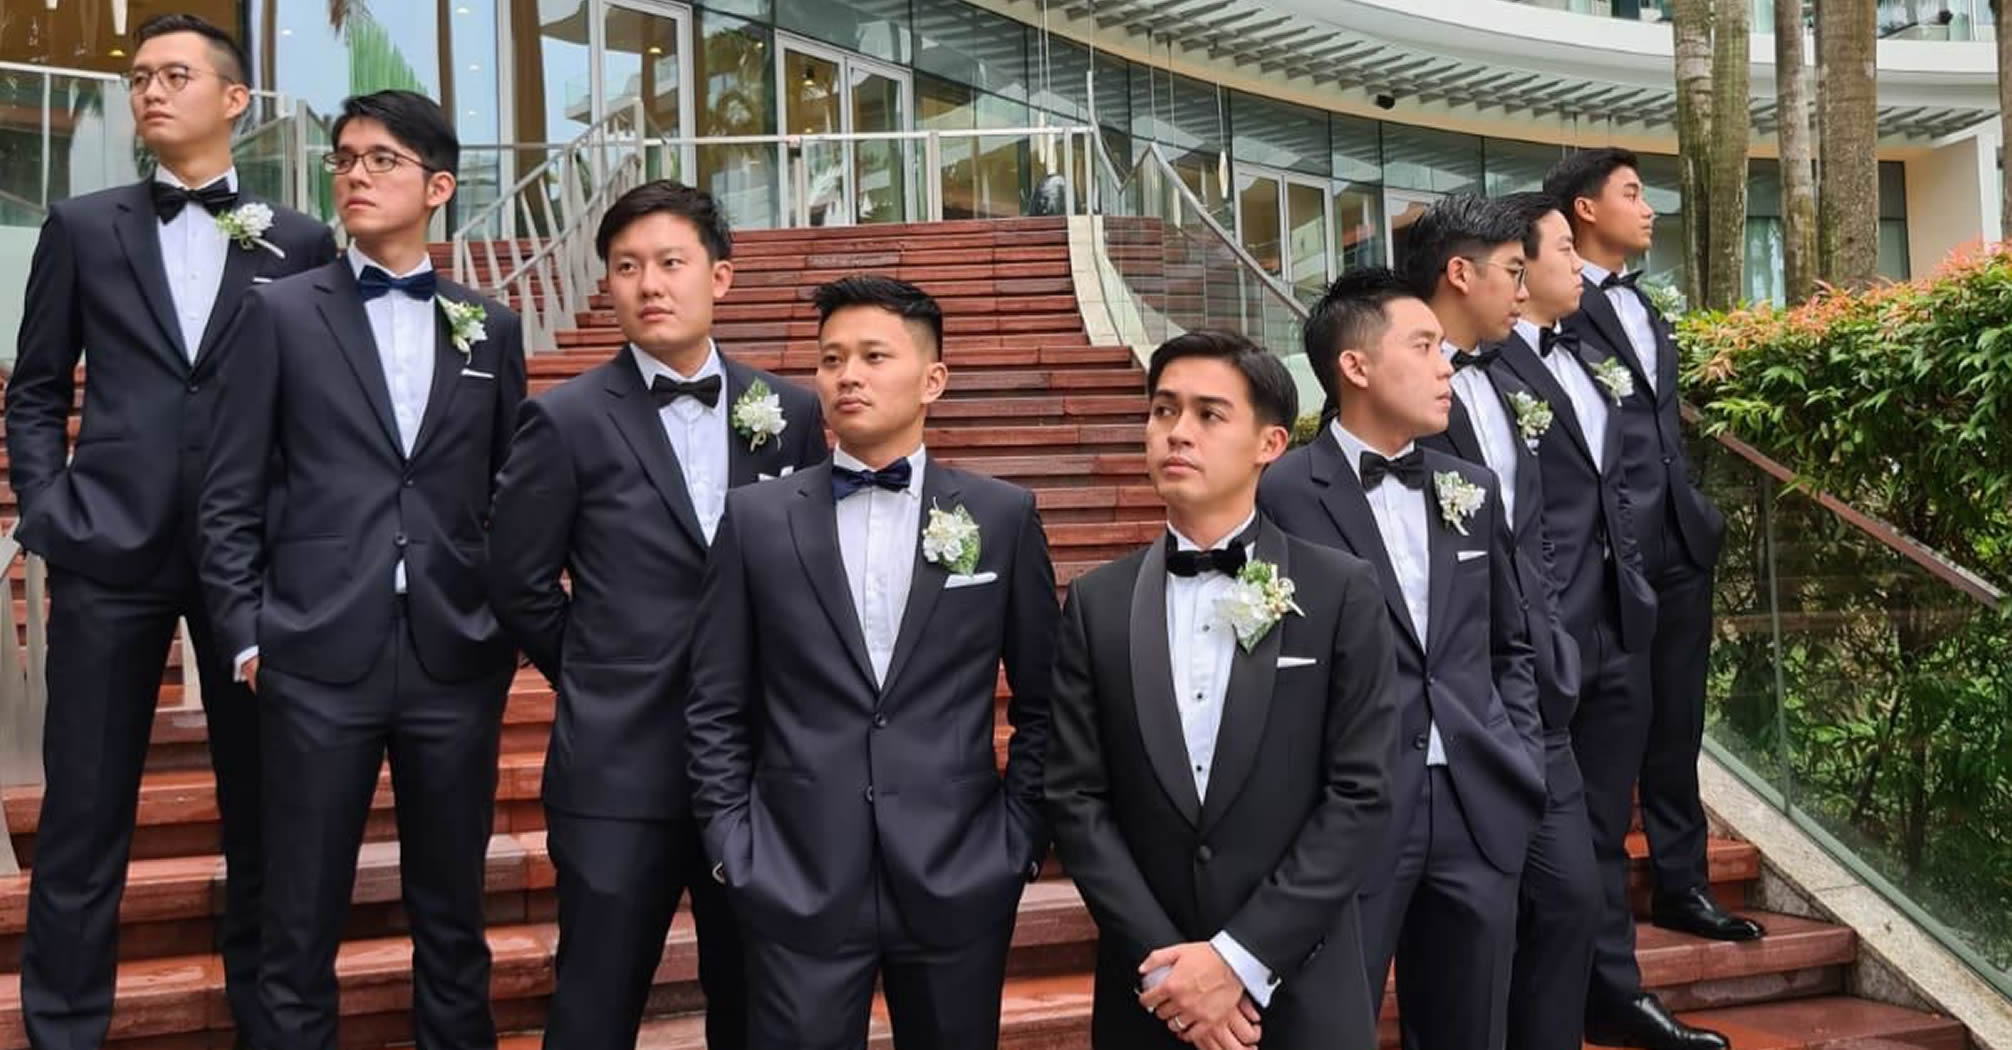 Groom Wedding Suit Rental